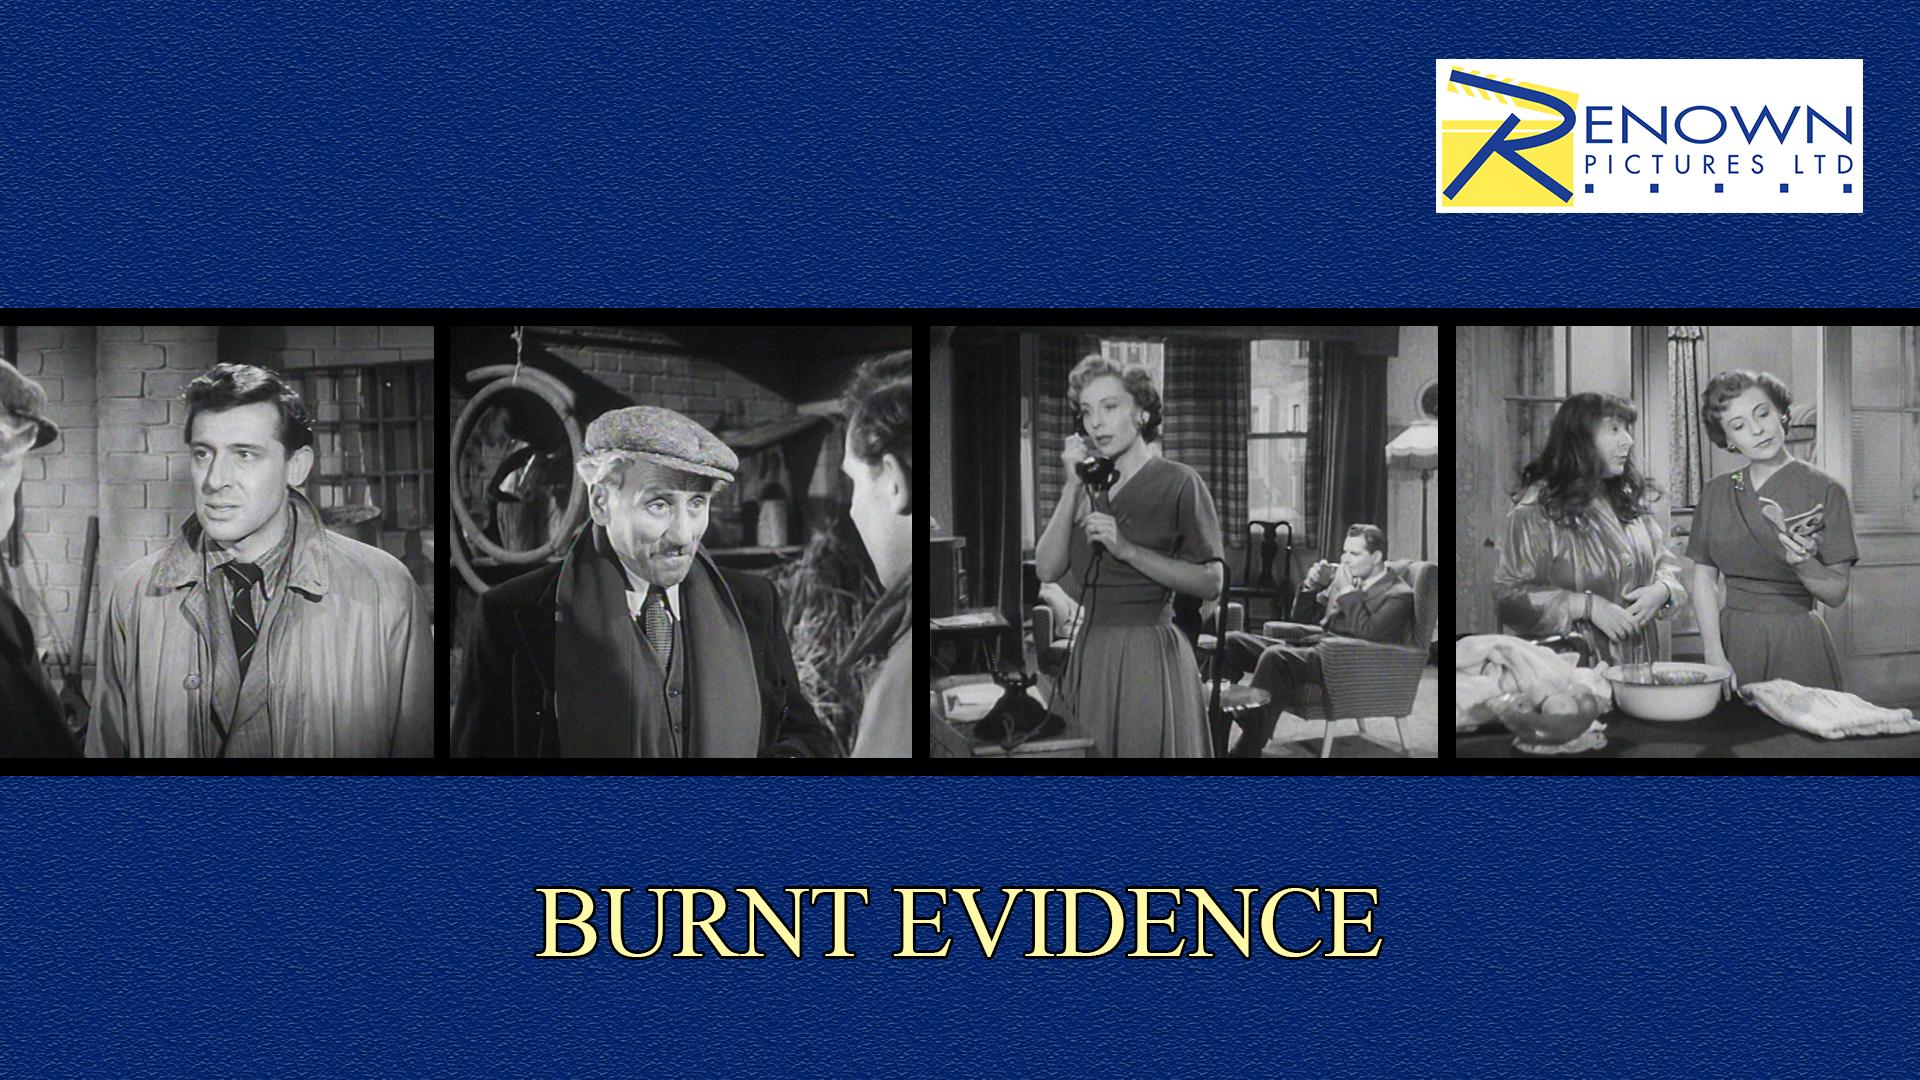 Burnt Evidence